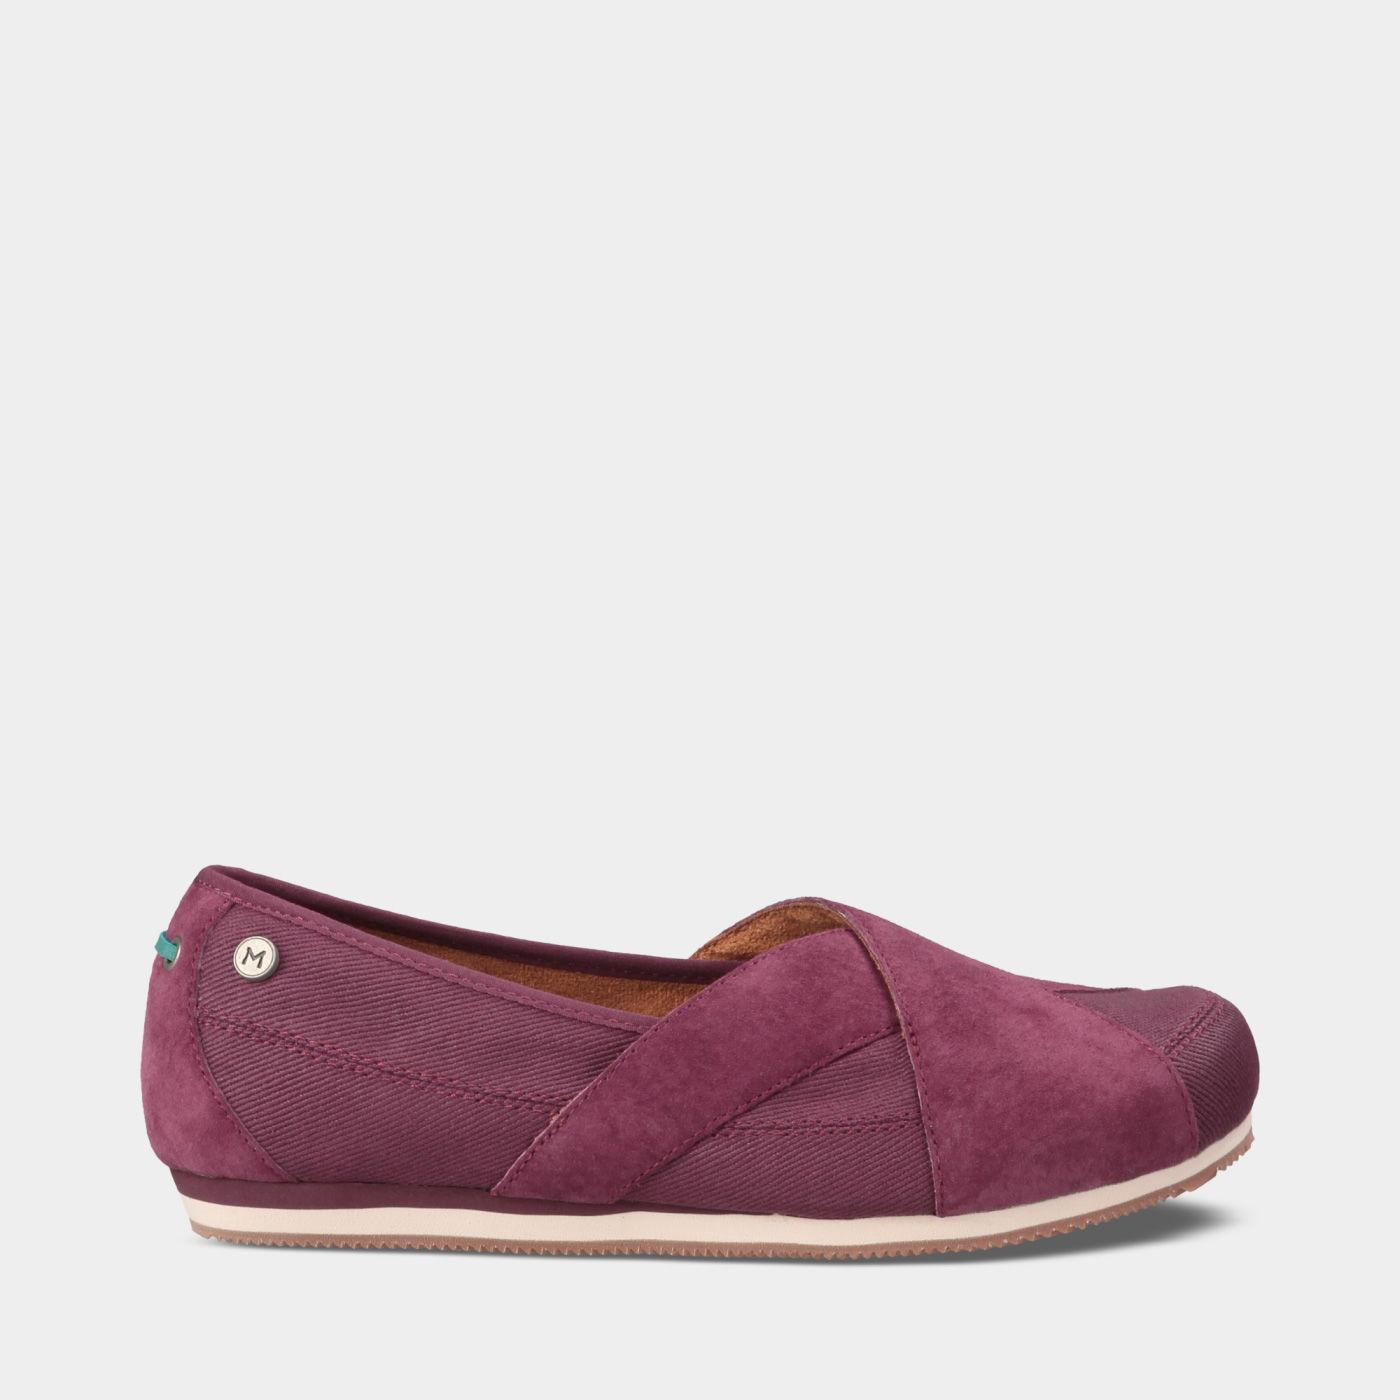 mozo 3740 pur 10 s sport suede canvas shoes slip